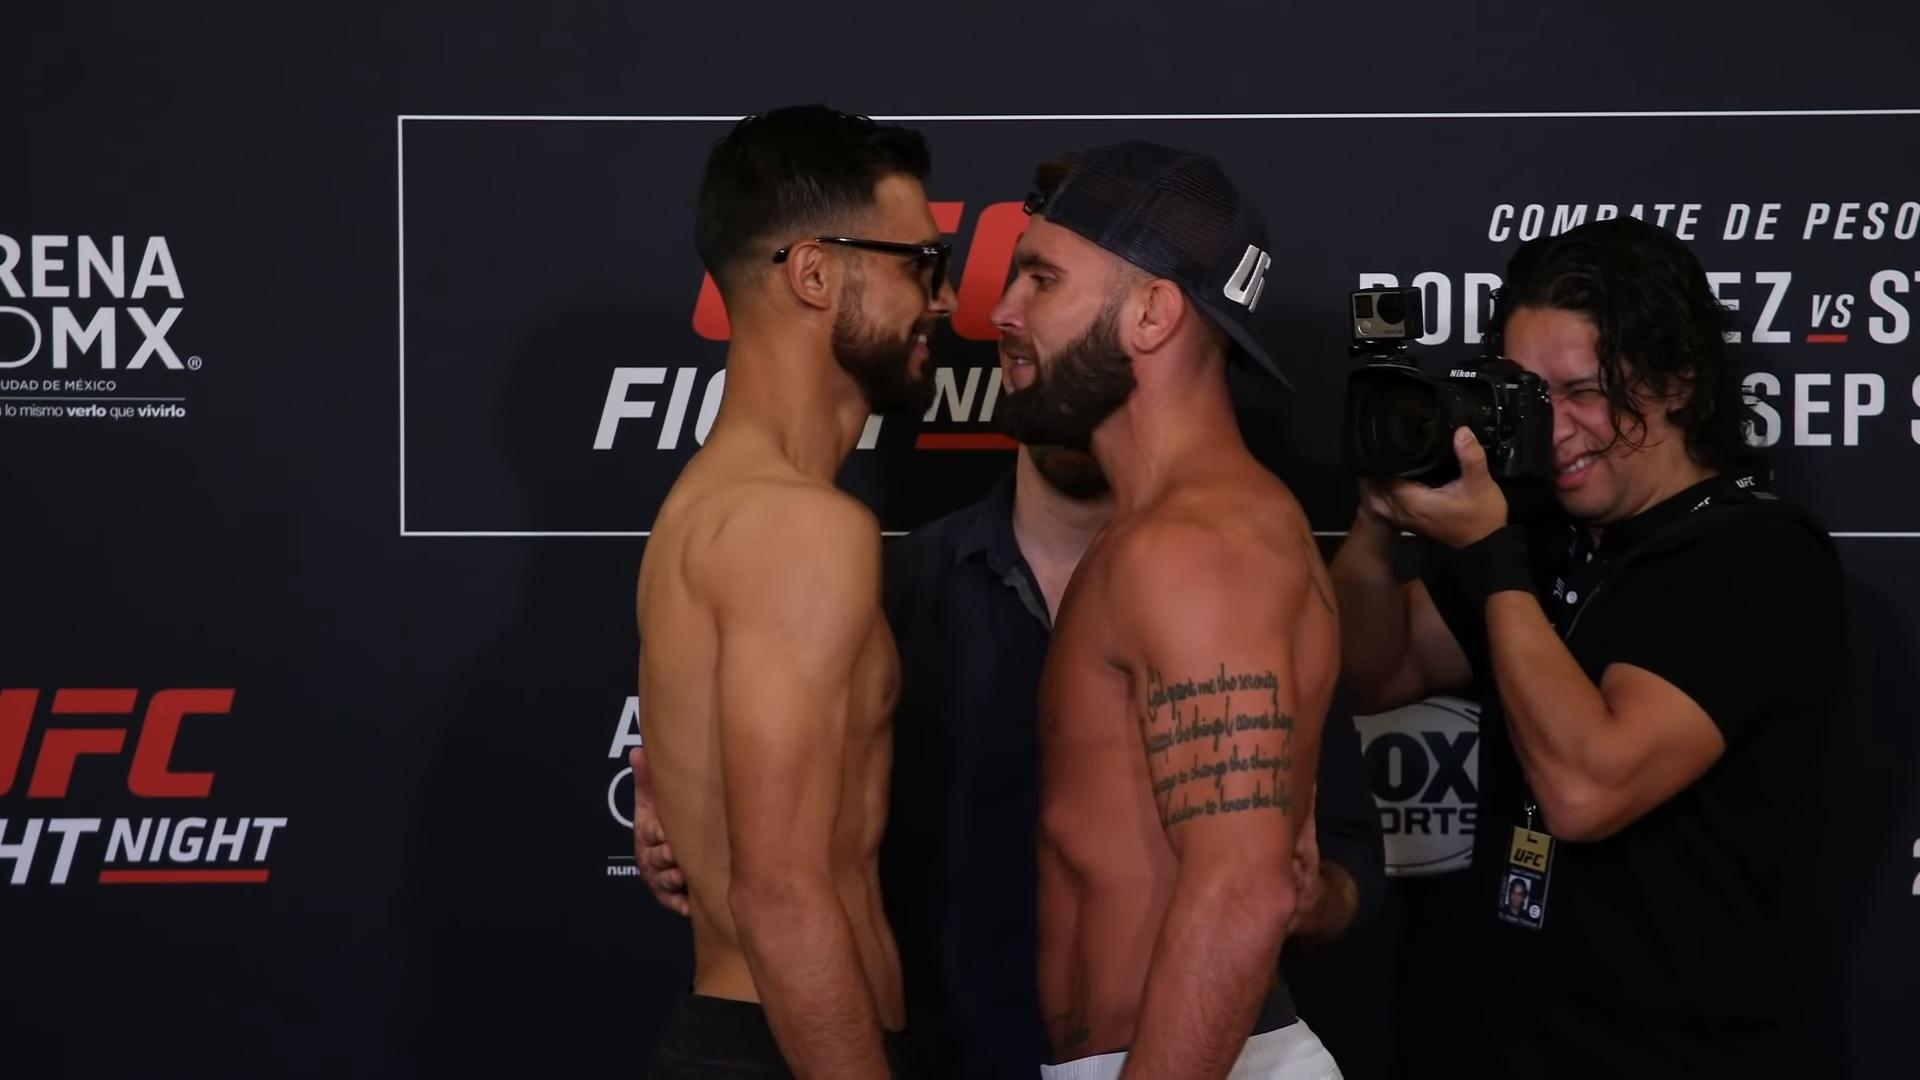 Rodriguez vs. Stephens